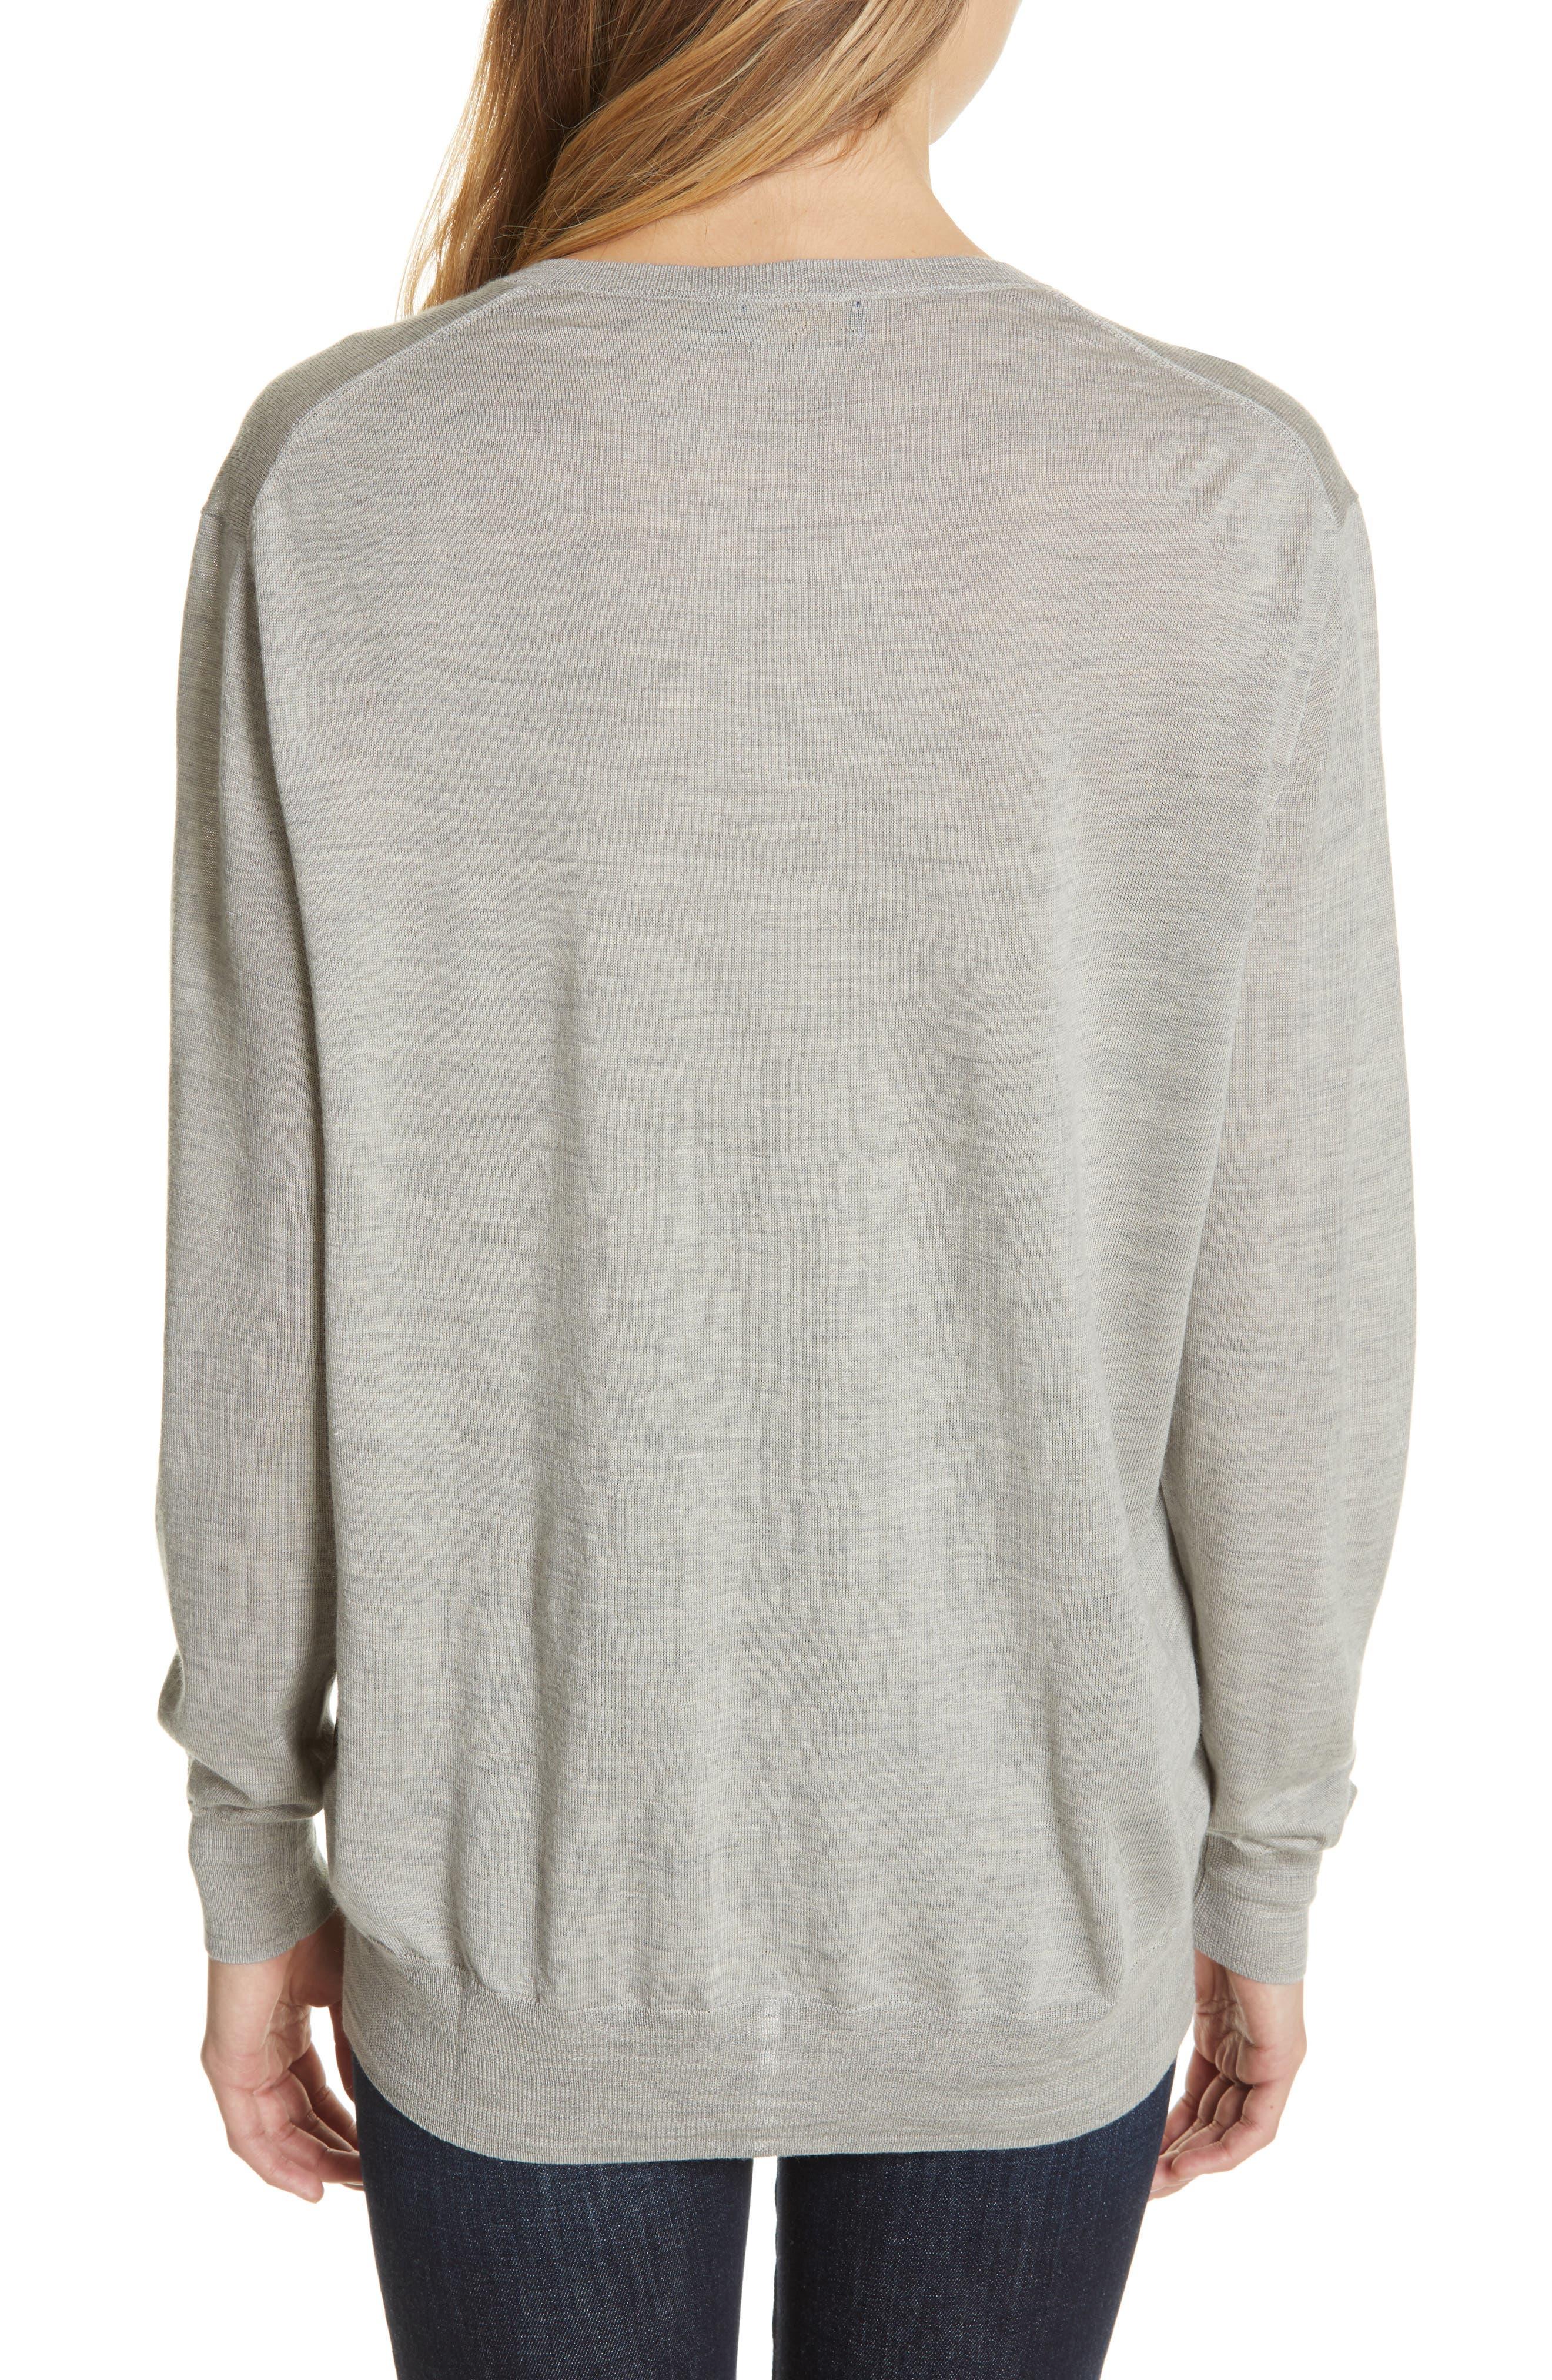 POLO RALPH LAUREN,                             V-Neck Wool, Silk & Cashmere Sweater,                             Alternate thumbnail 2, color,                             LIGHT VINTAGE HEATHER